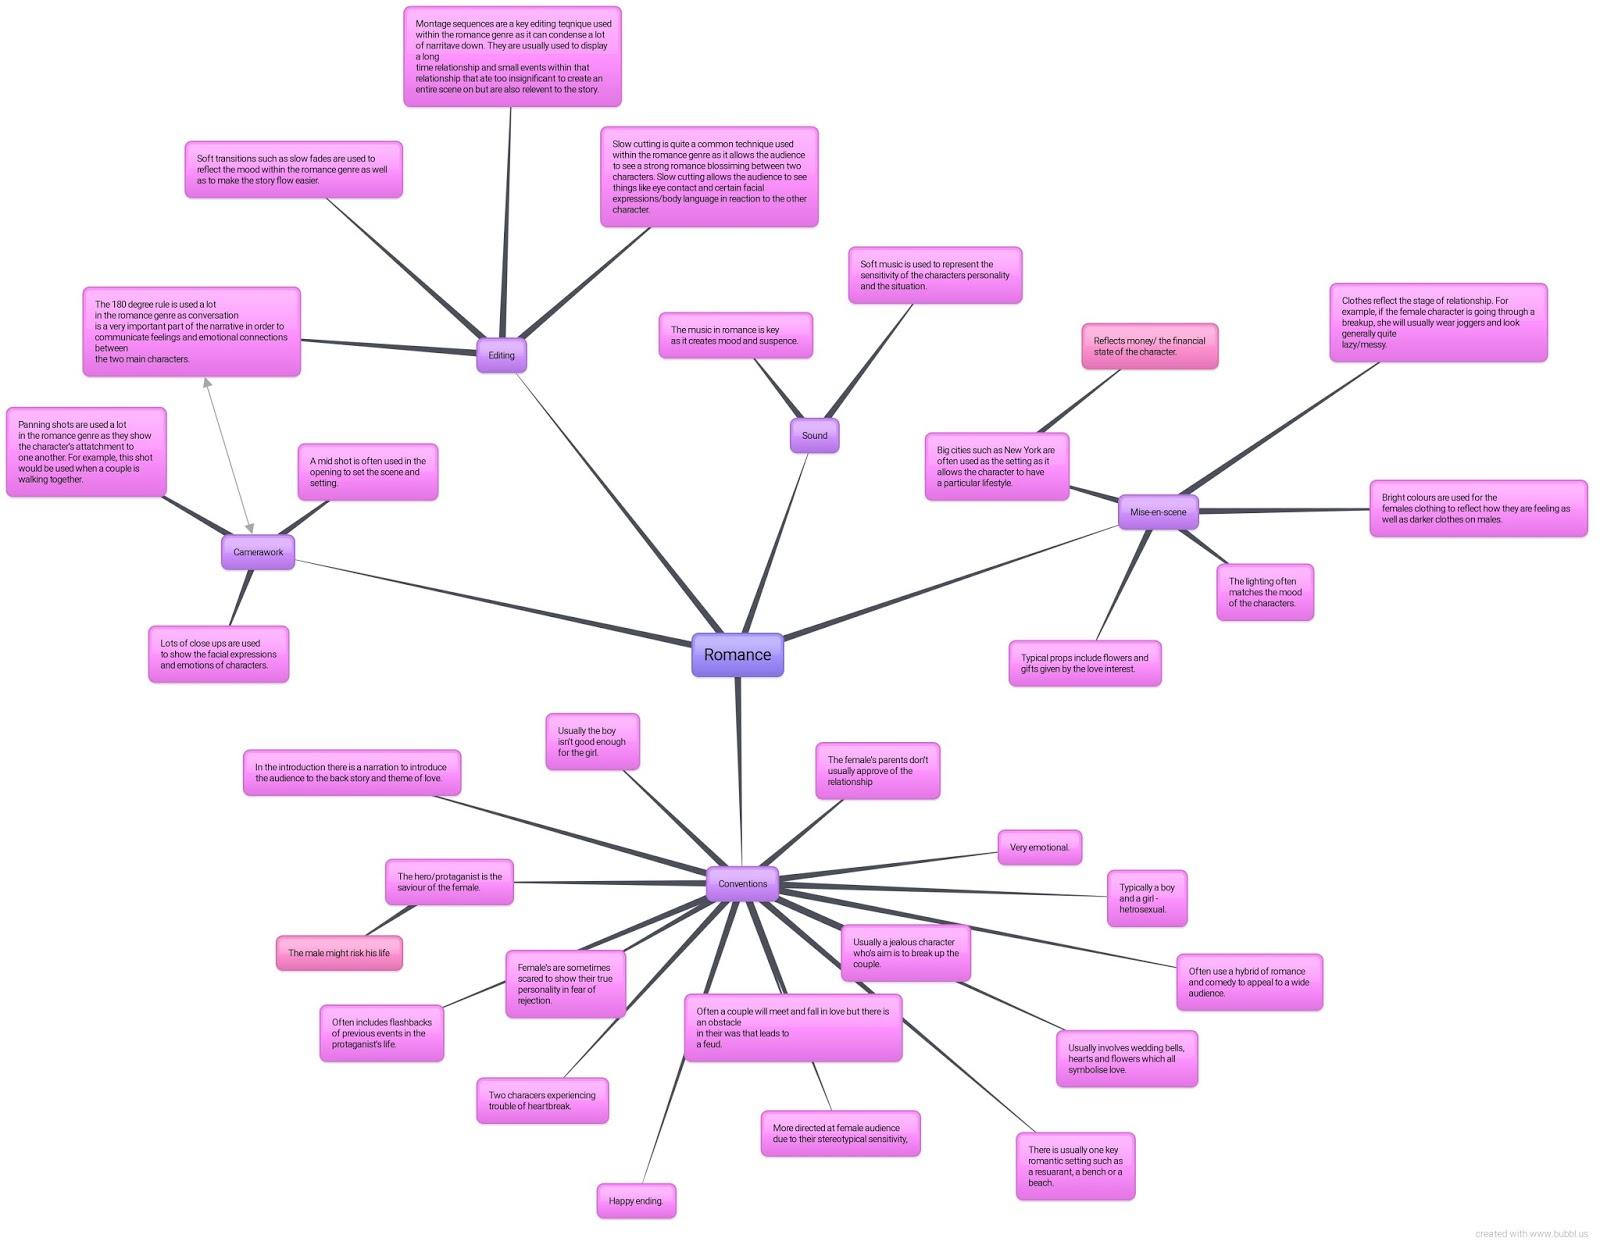 genre conventions mind map